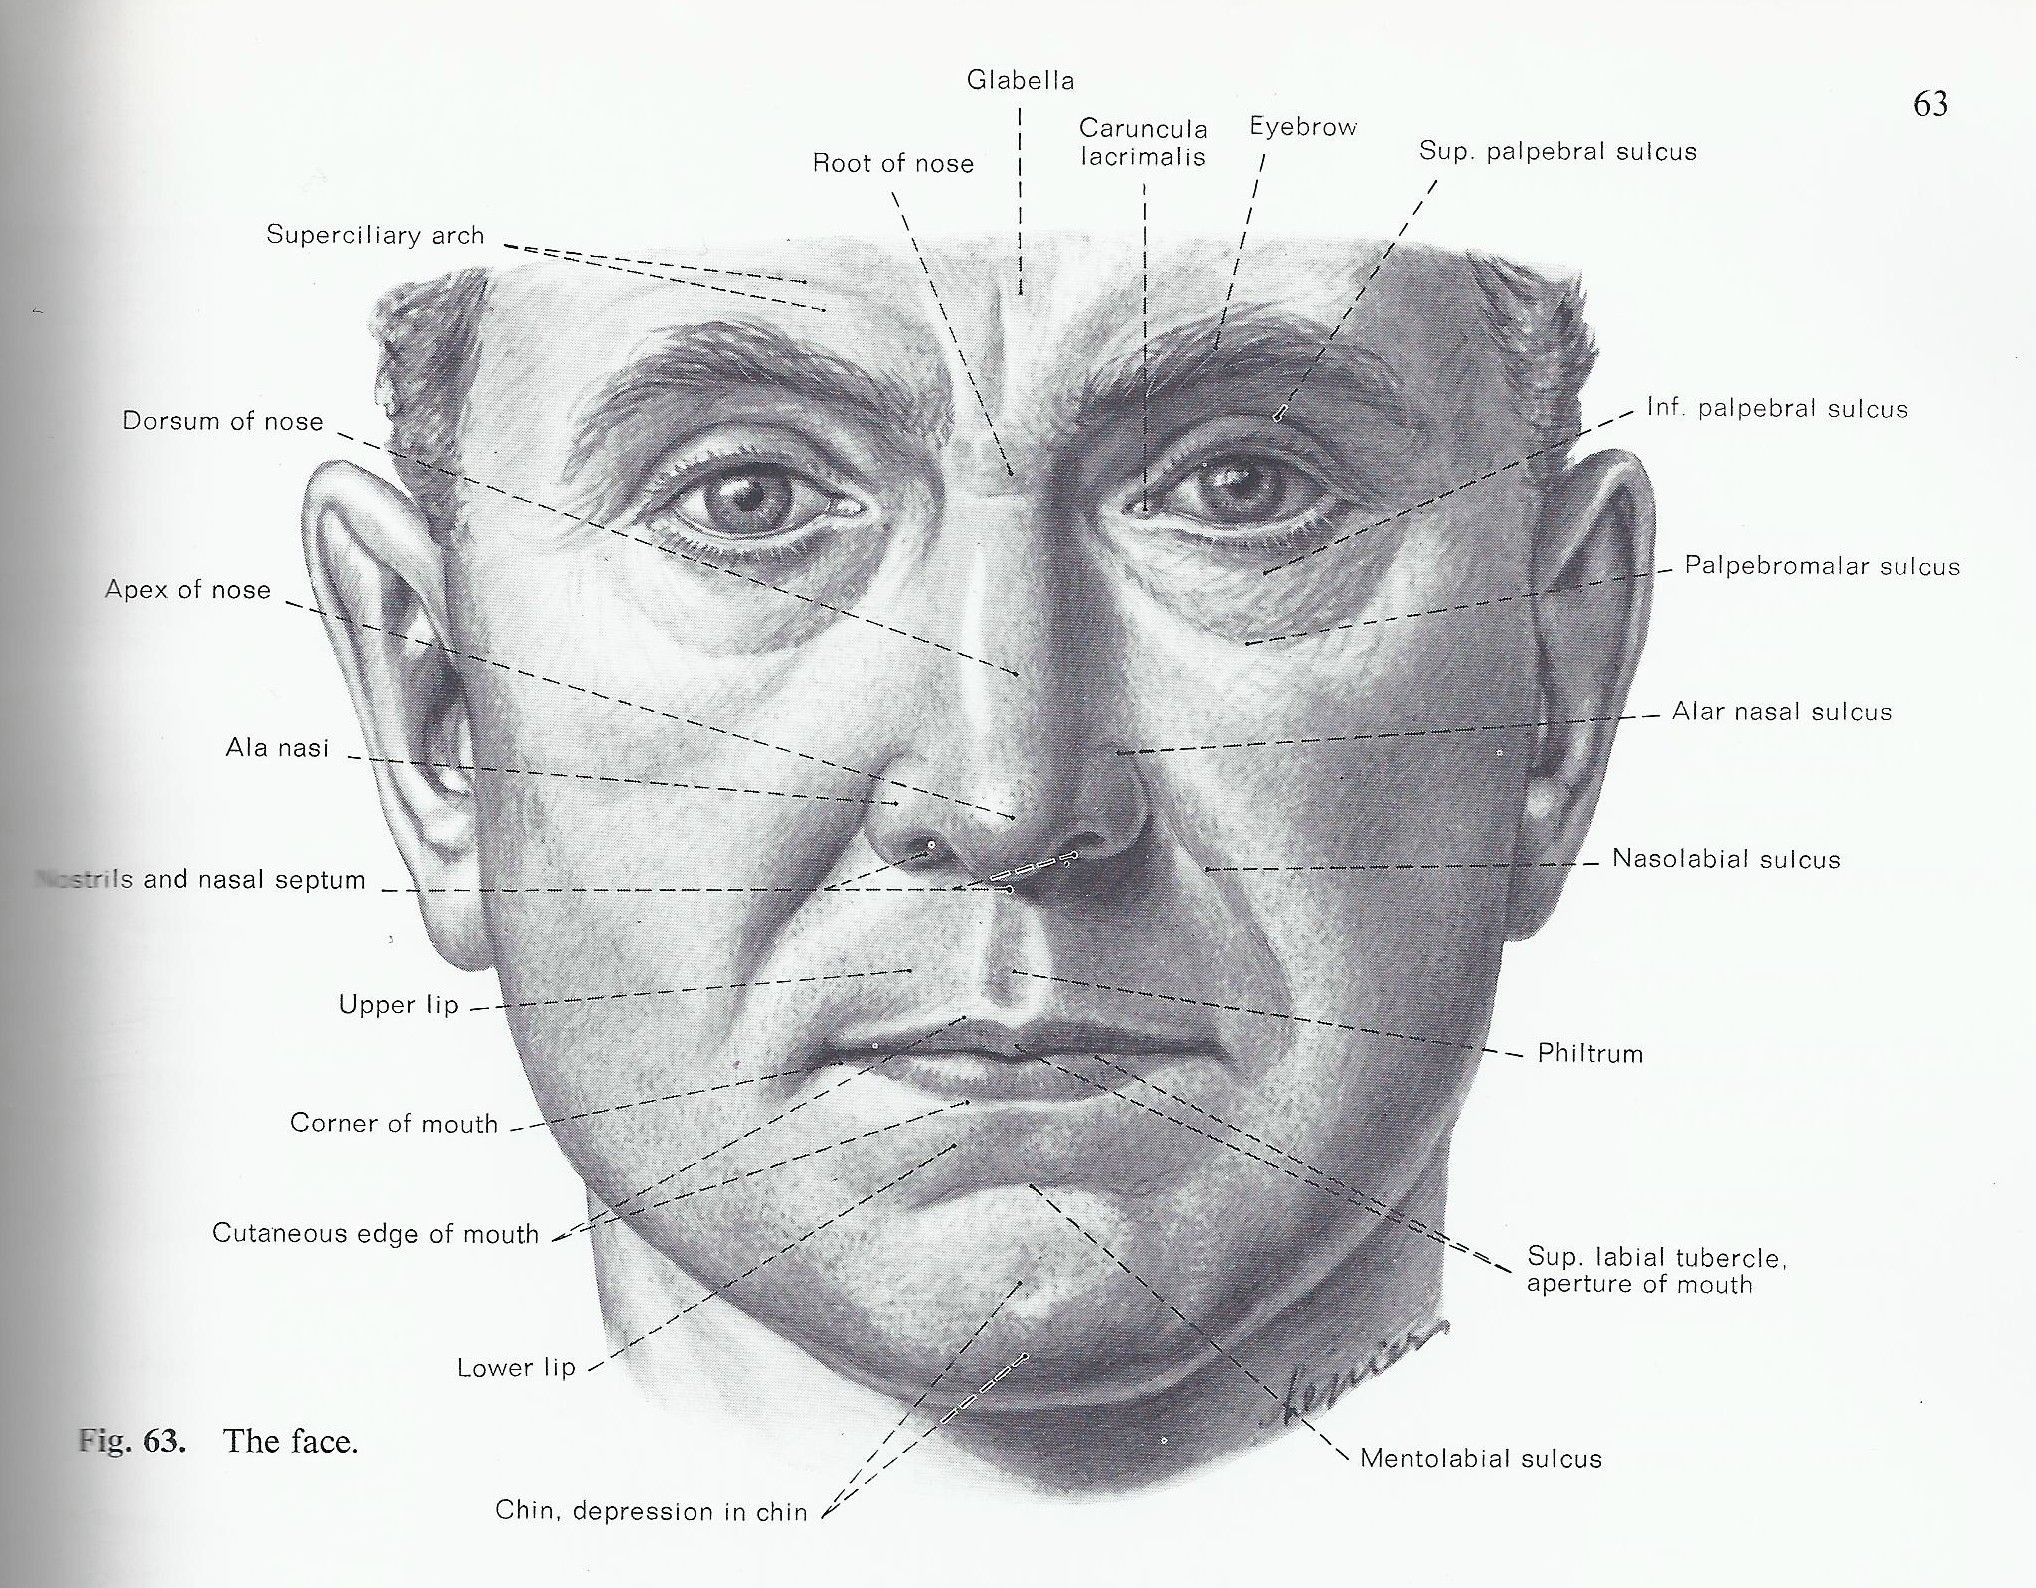 Acne Face Diagram Download Fishbone Template Powerpoint Cheek Bone 10 Stromoeko De Anatomy Human Rh Pinterest Com